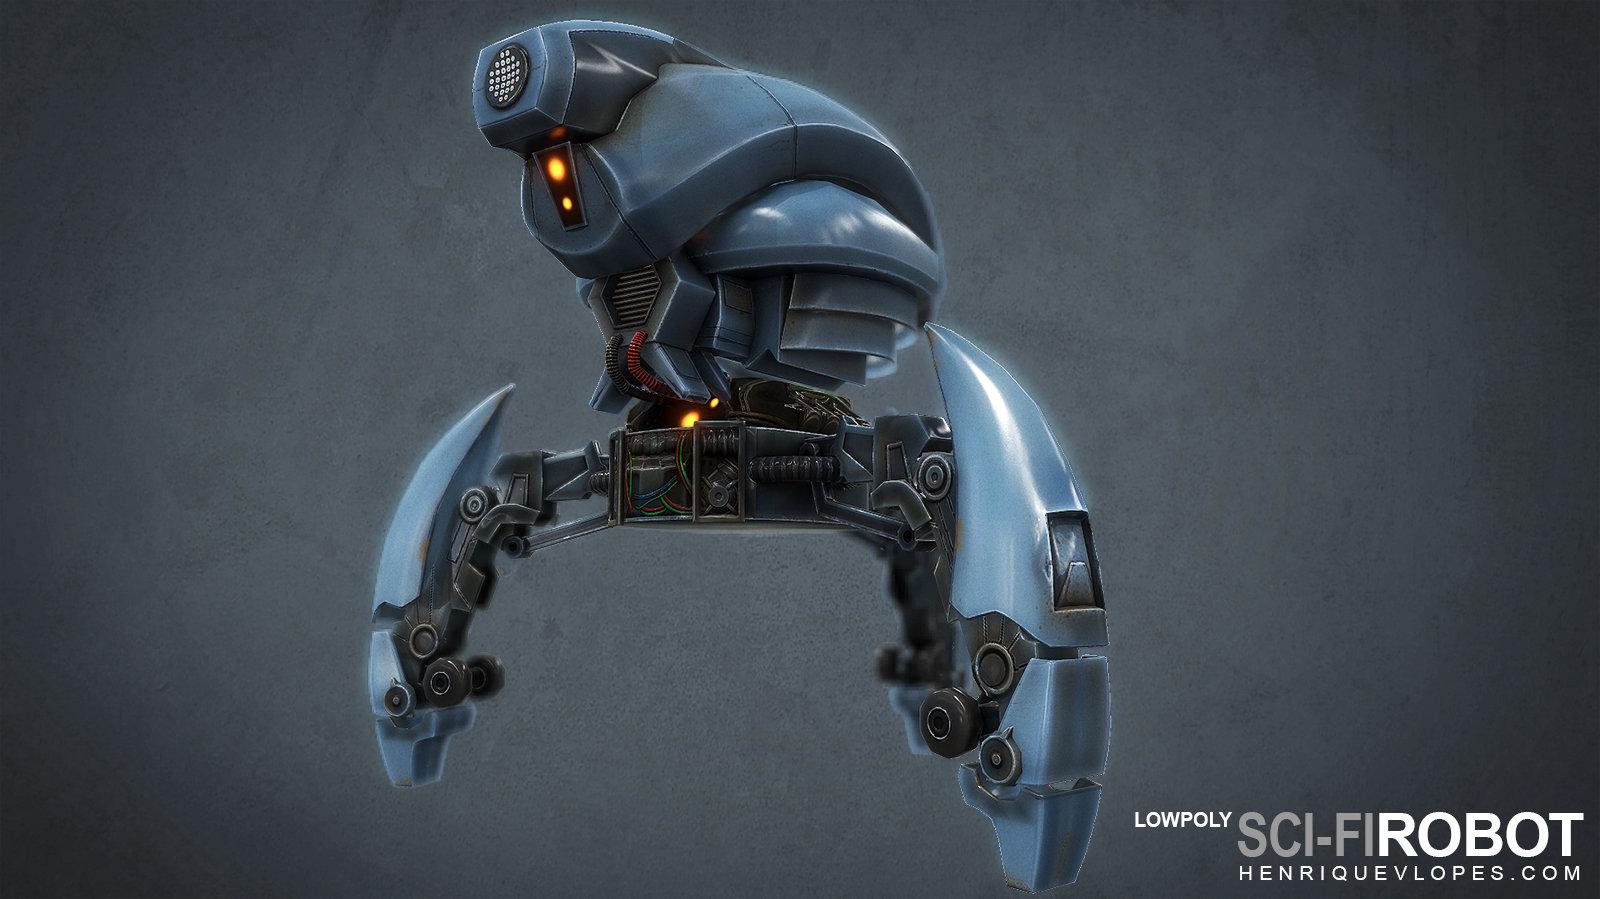 Scifirobot lowpoly02